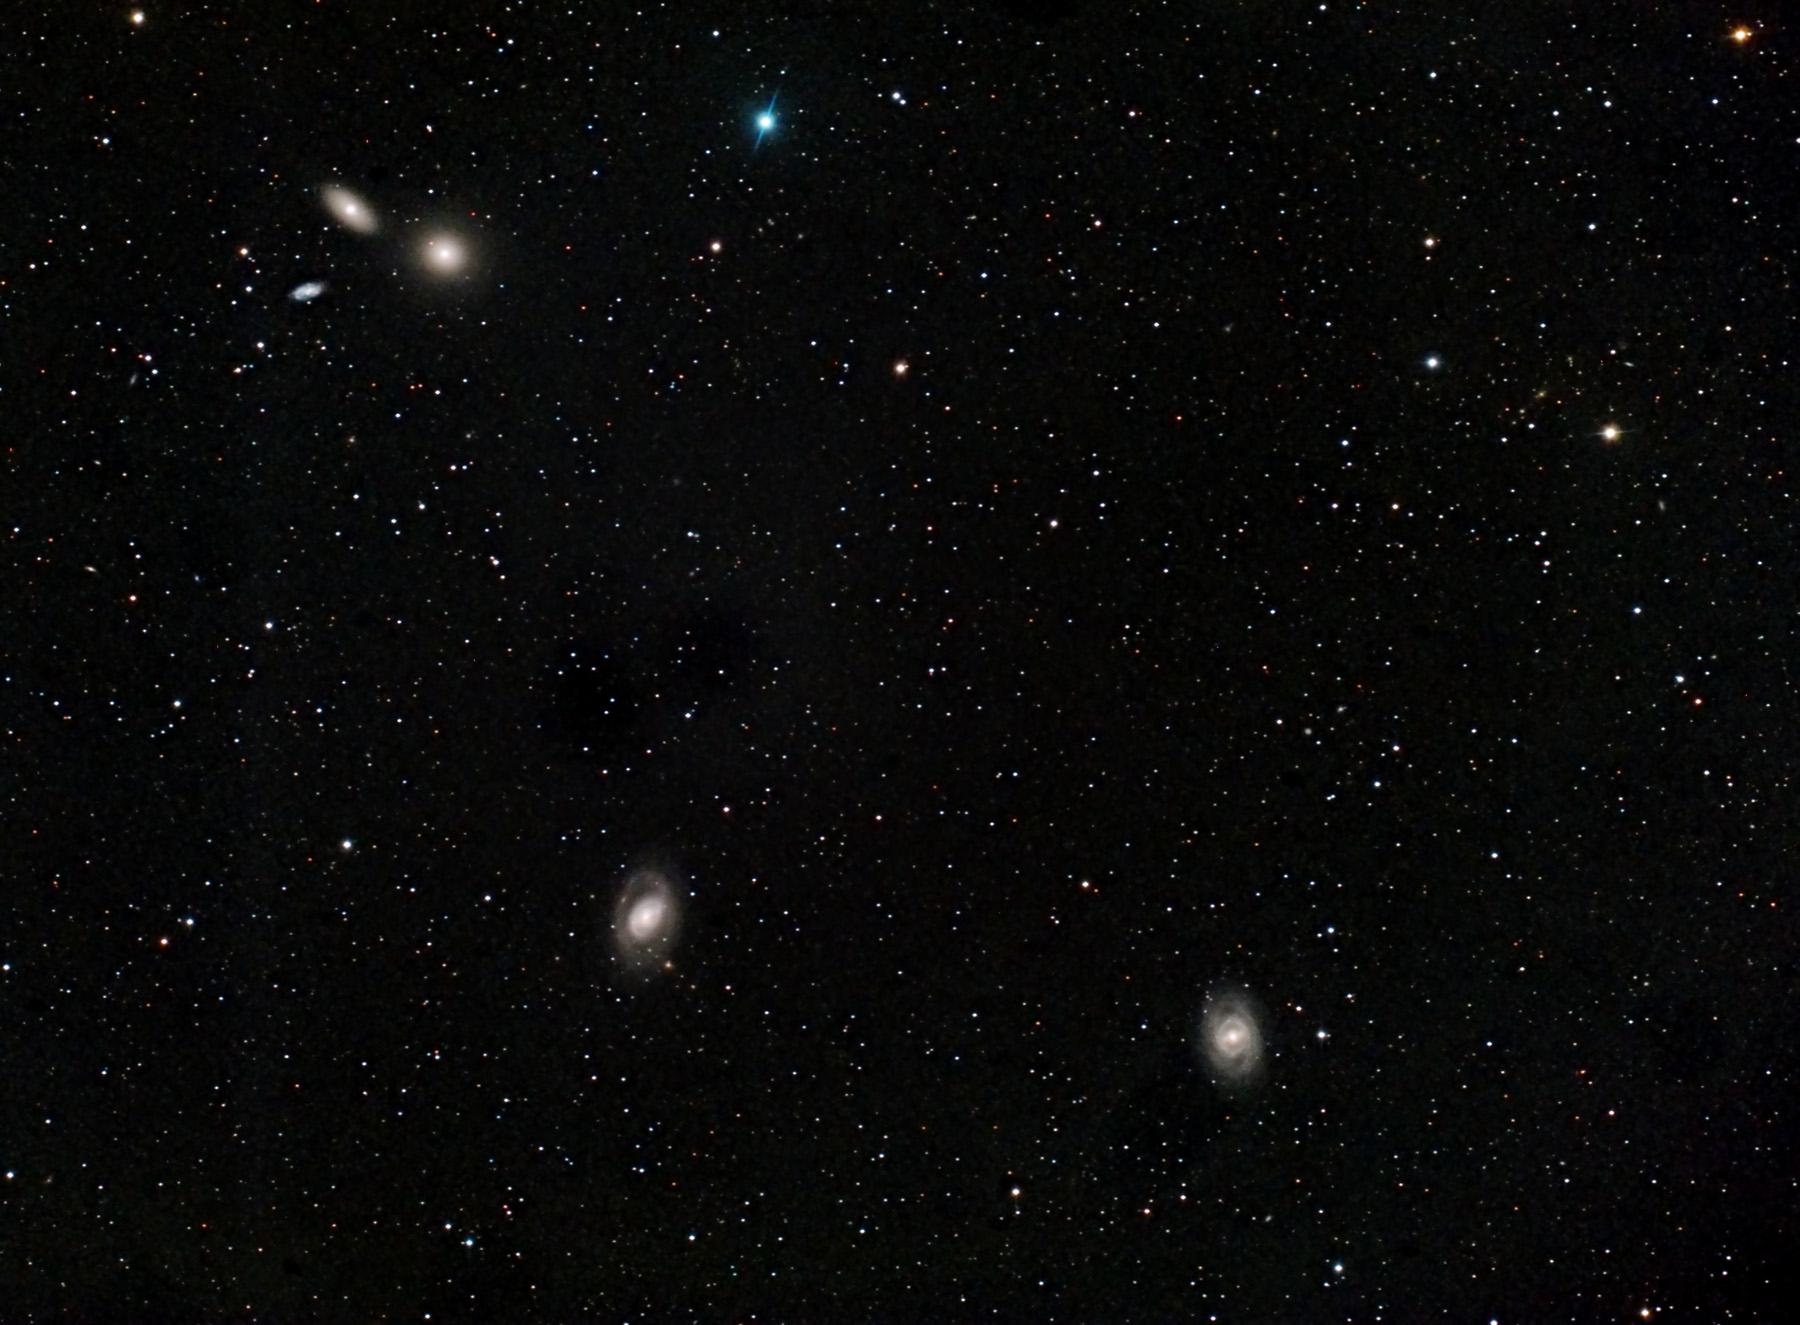 Galàxies a Leo: M95, M96, M105 i NGC 3371 i 3389